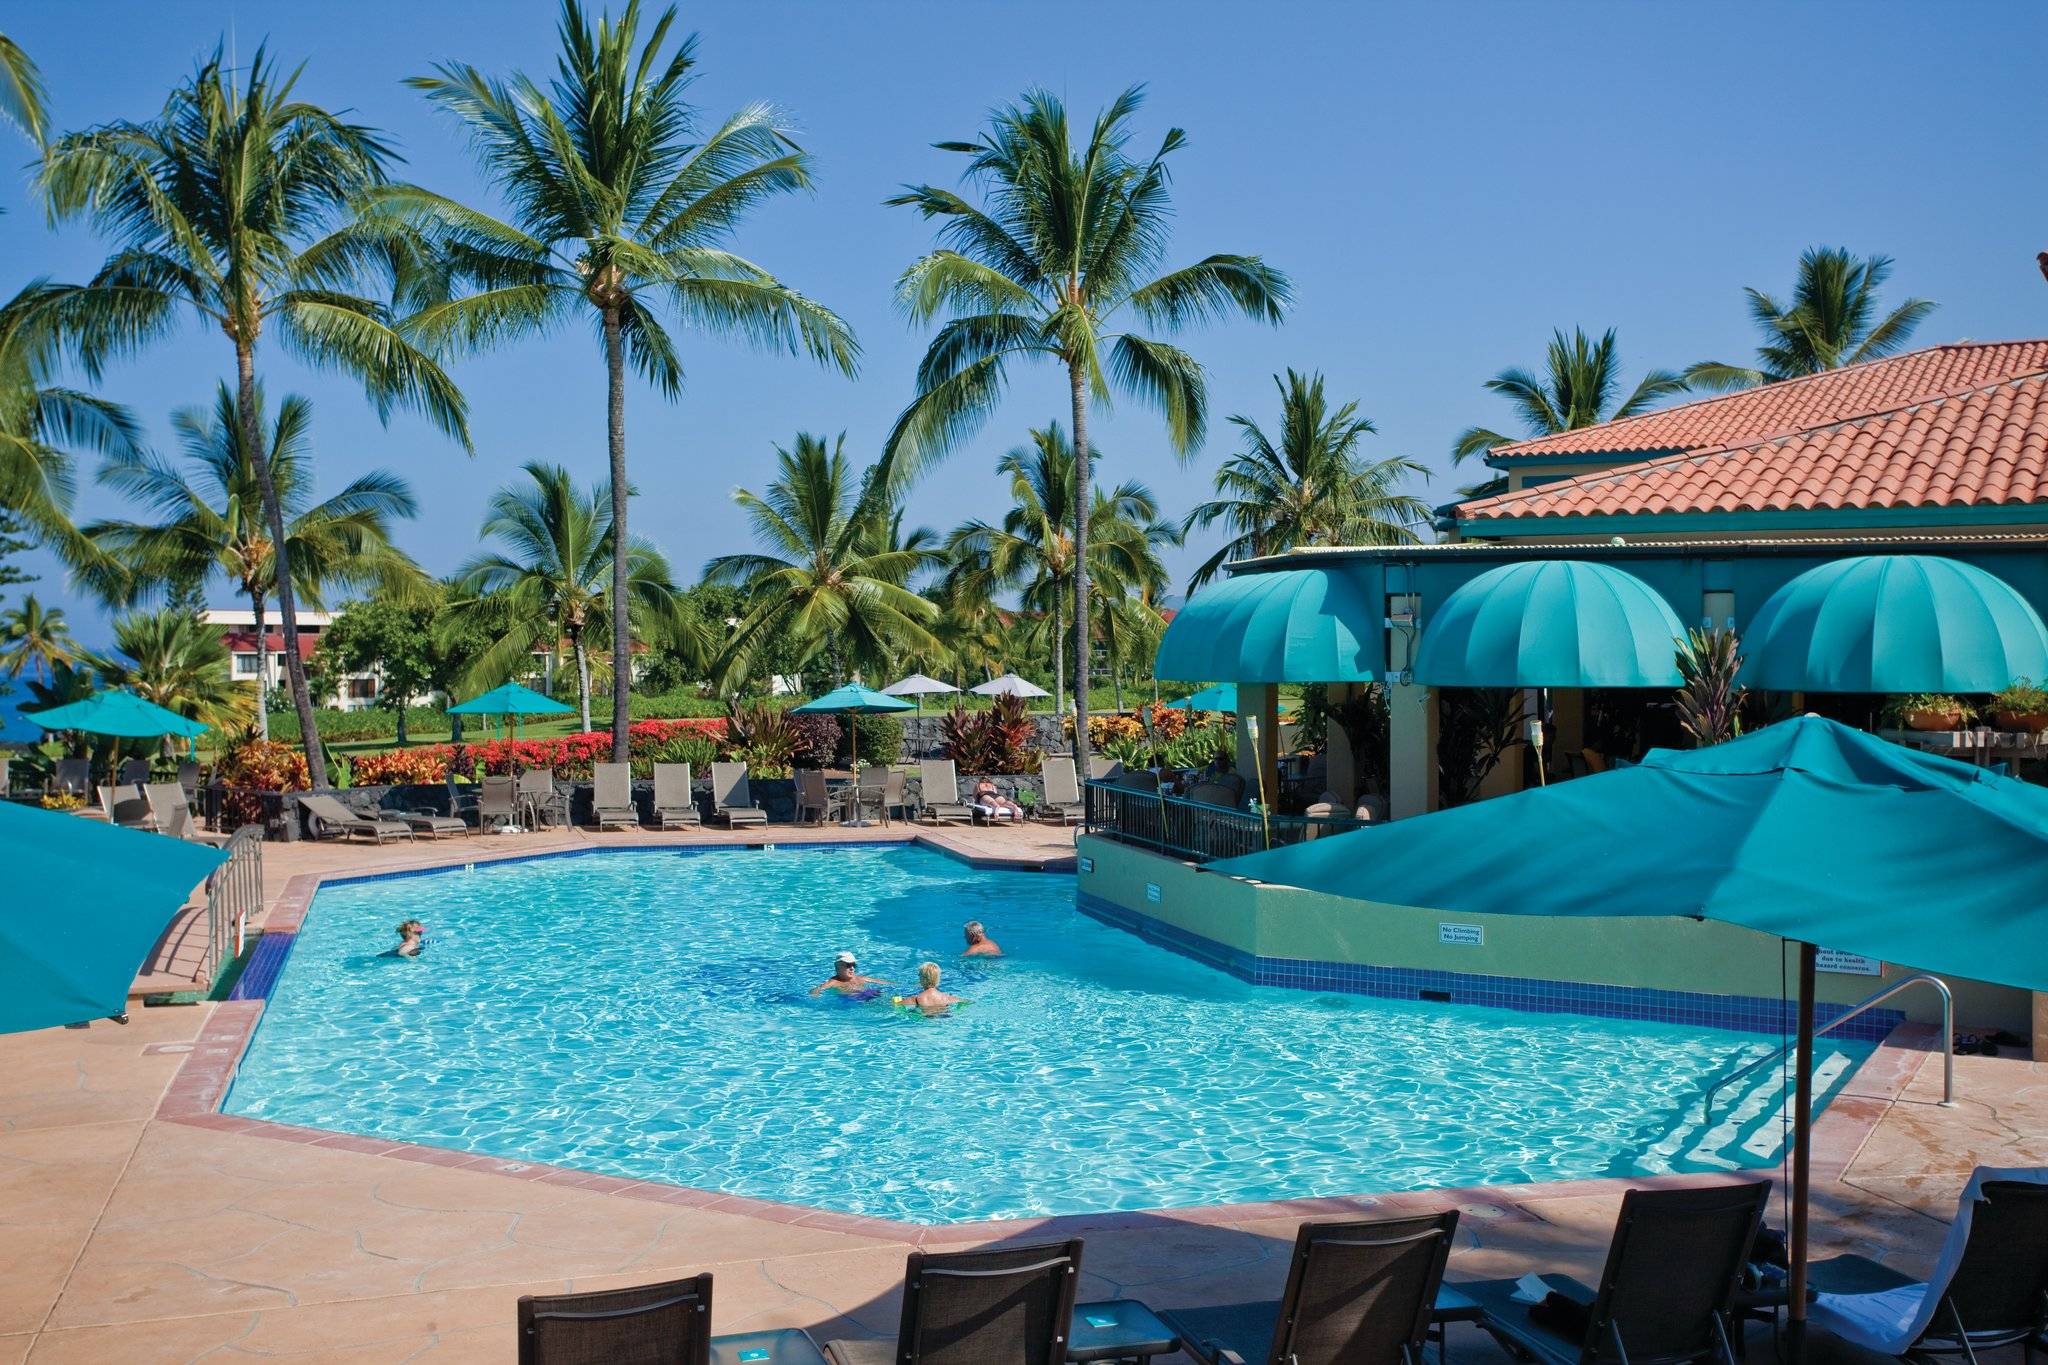 Specials At Kona Coast Resort In Kailua Kona Hawaii